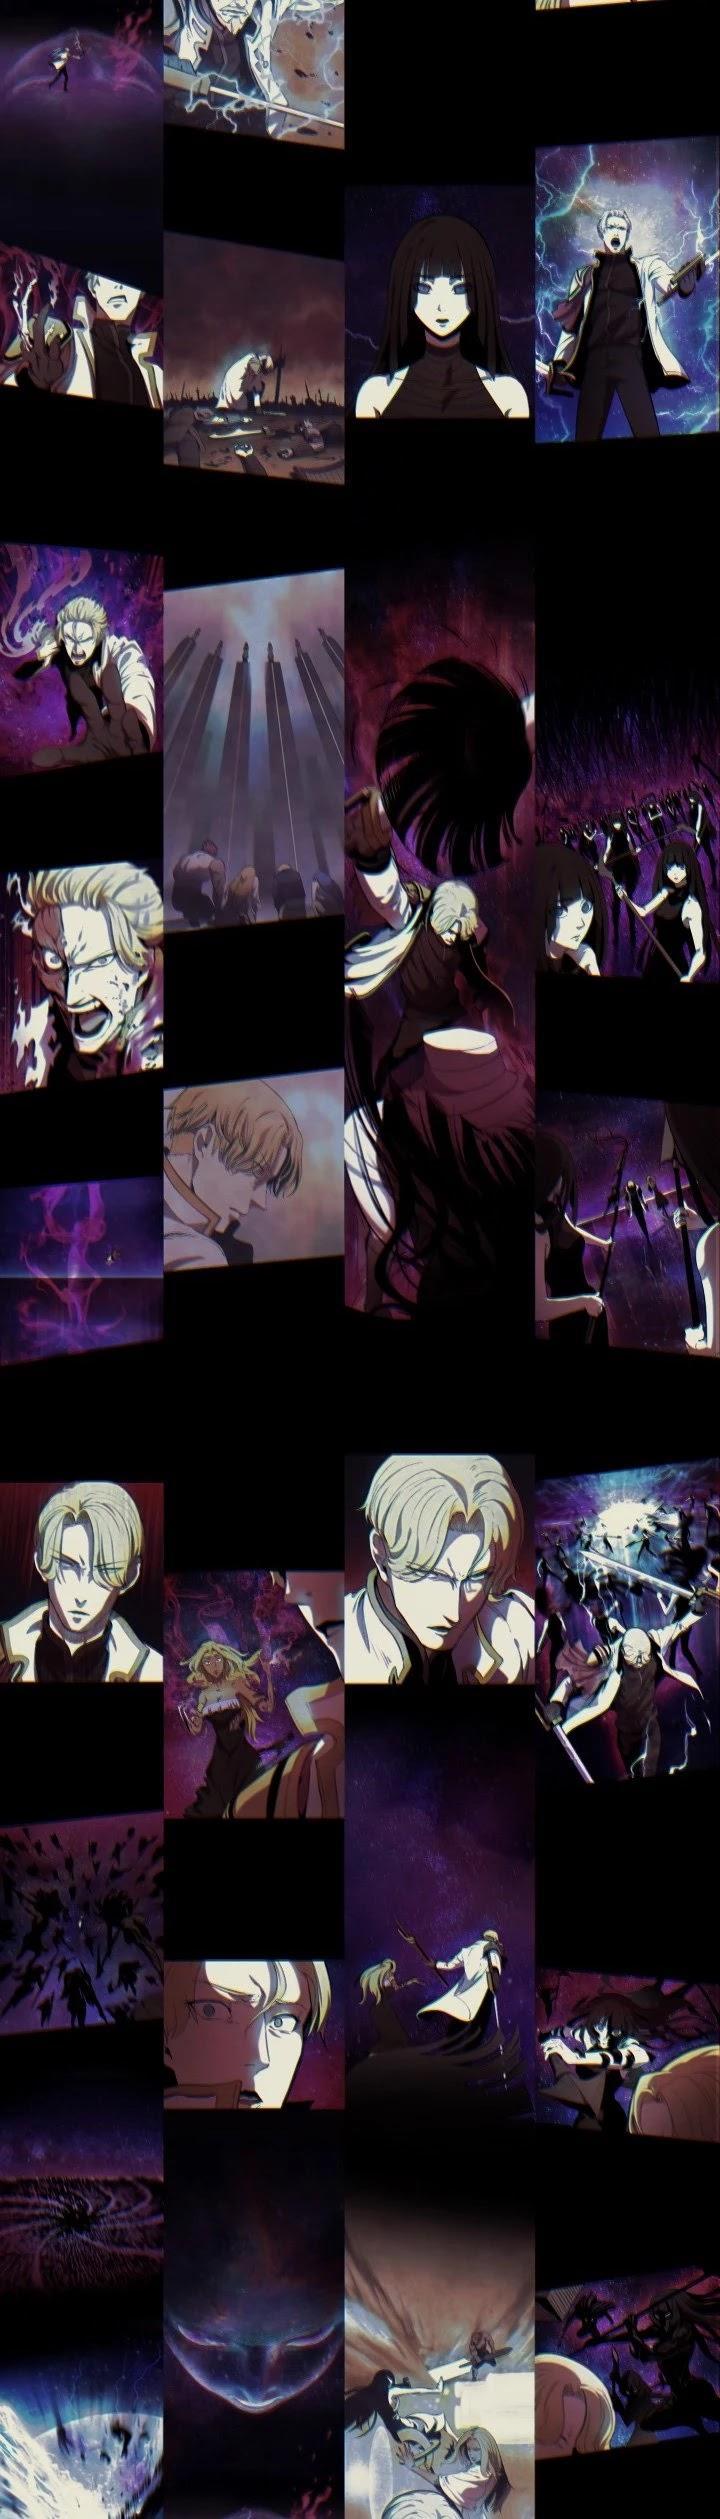 Survival Story Of A Sword King In A Fantasy World Chapter 50: End Season 1 page 40 - Mangakakalots.com